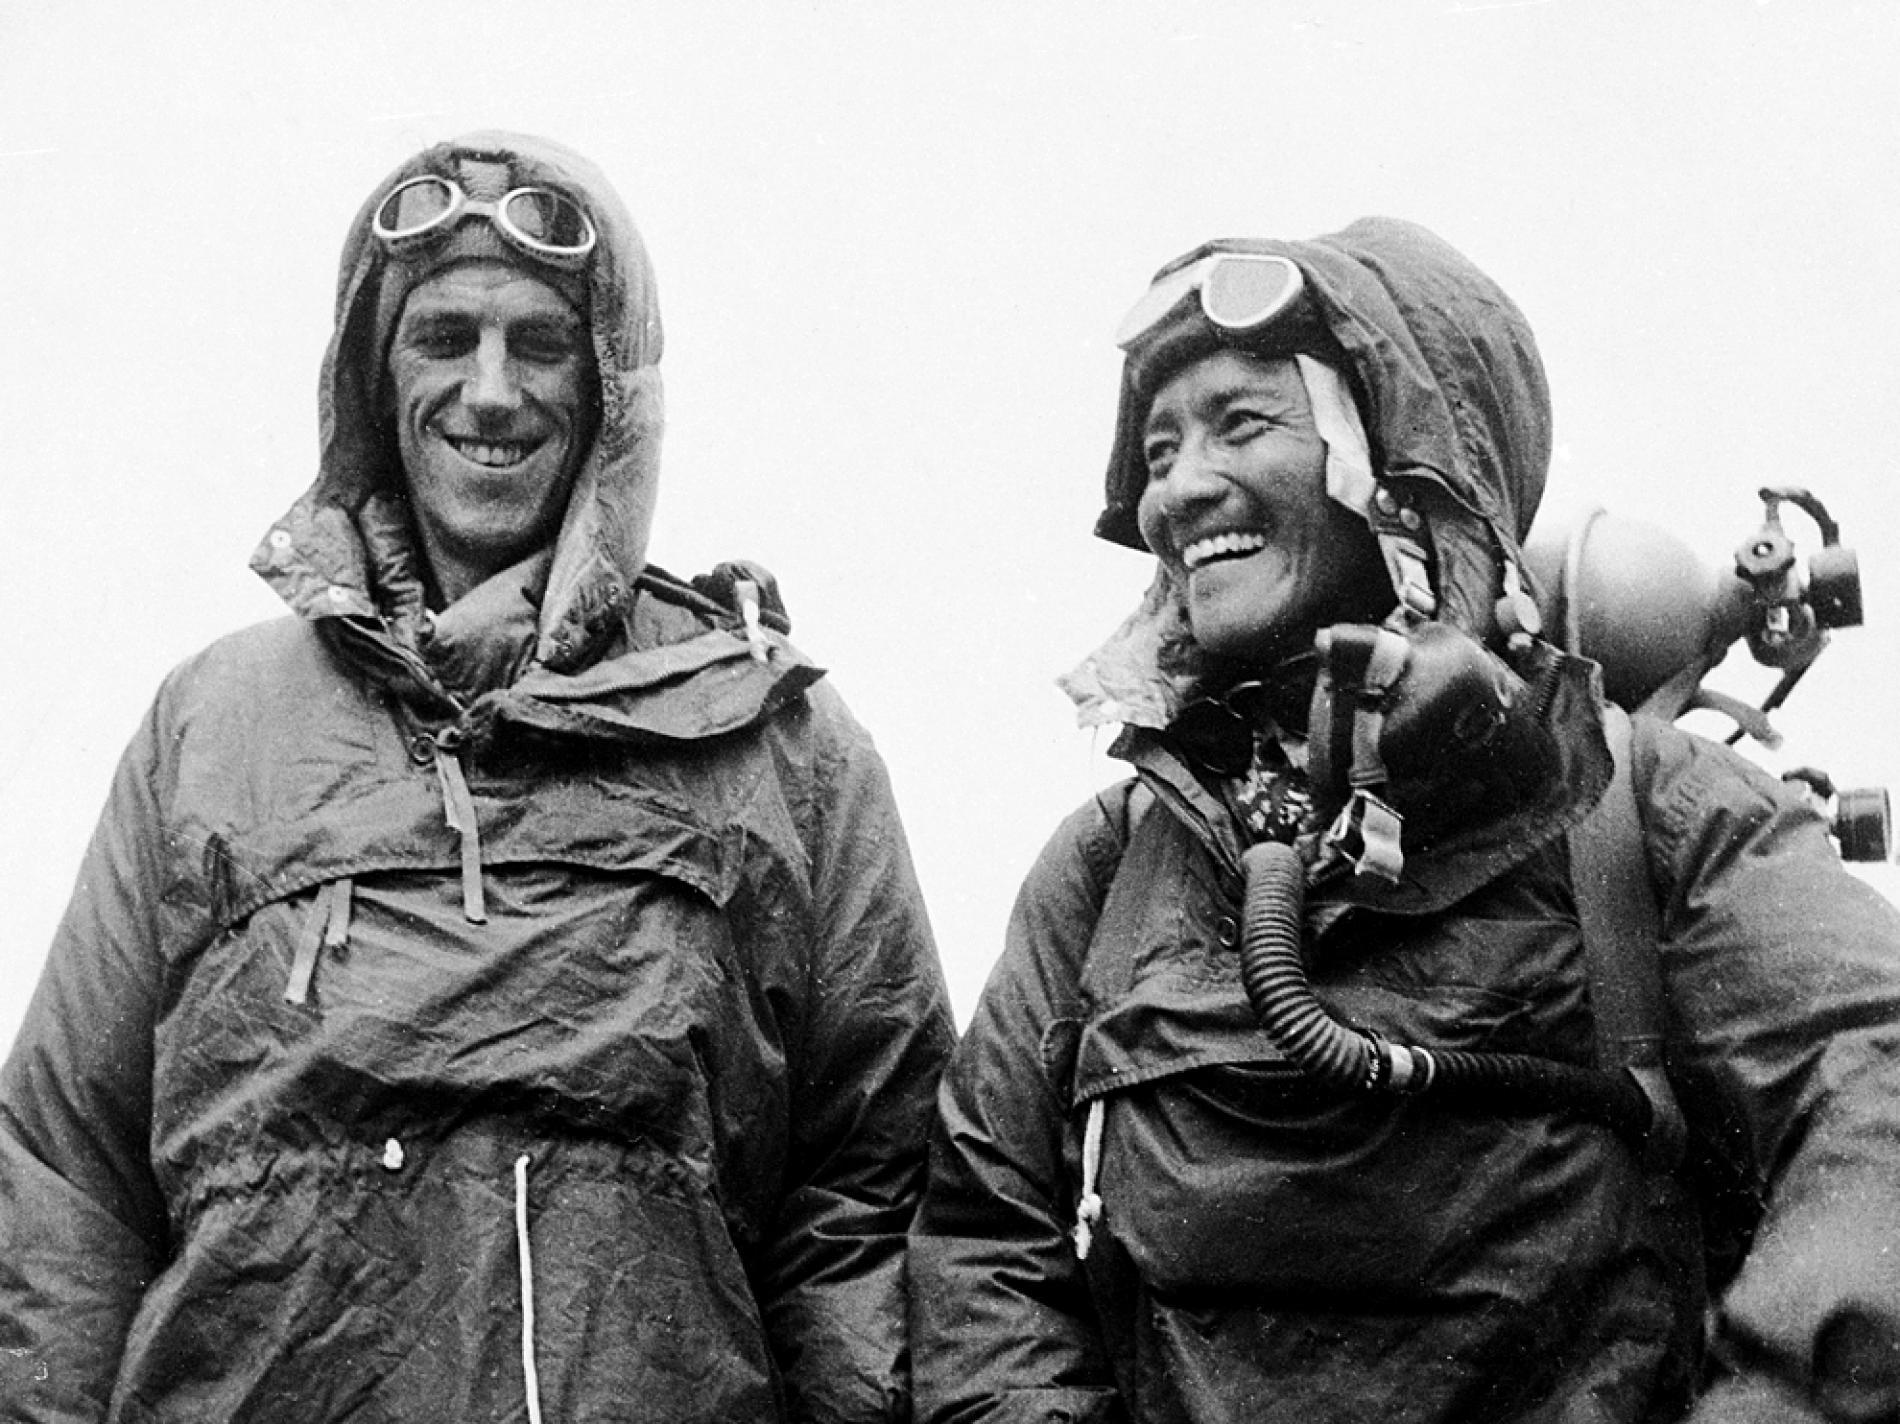 Edmund Hillary and Tenzing Norgay, 1953